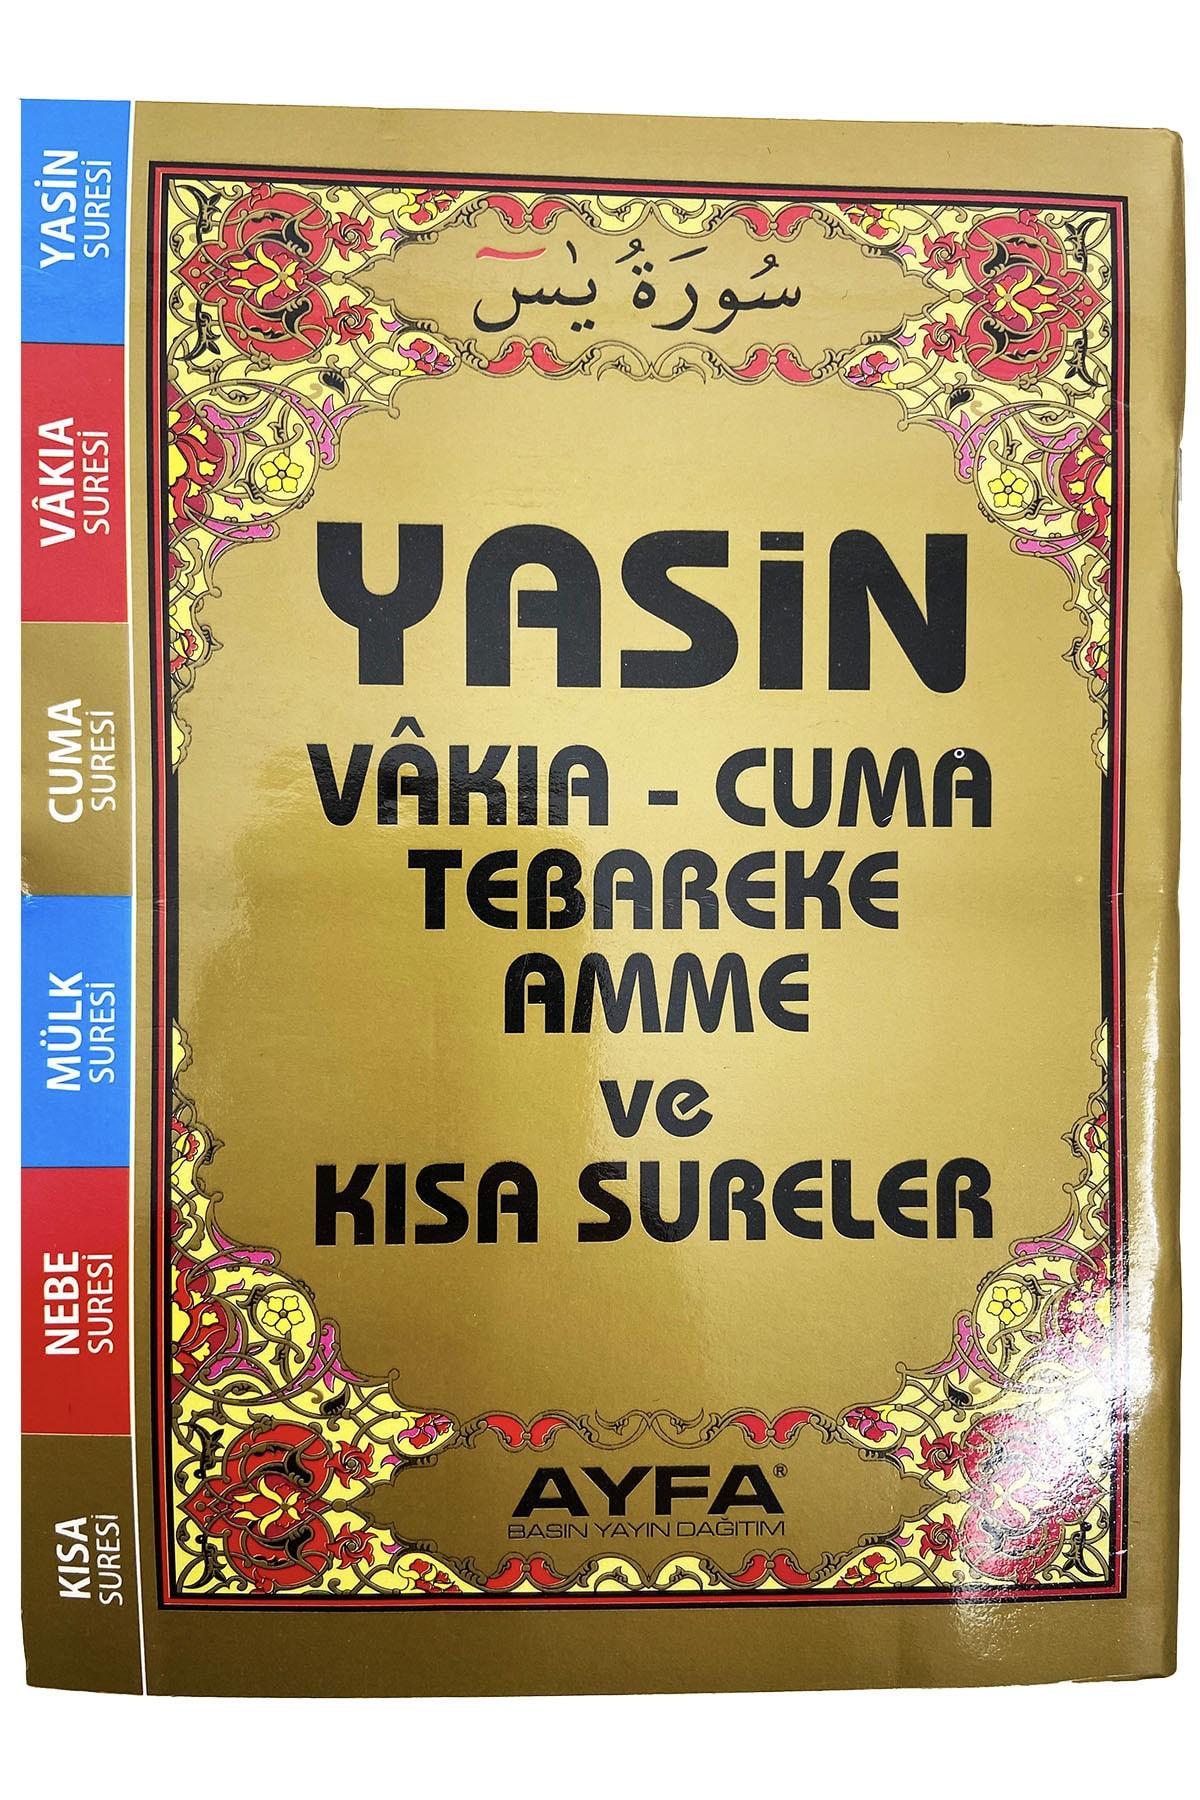 Ayfer To Bag Size Yasin Fihristli Written Large Yasini Serif Book Home Boxed Gift Yasin Prayer Rug Rosary Set мусульмански